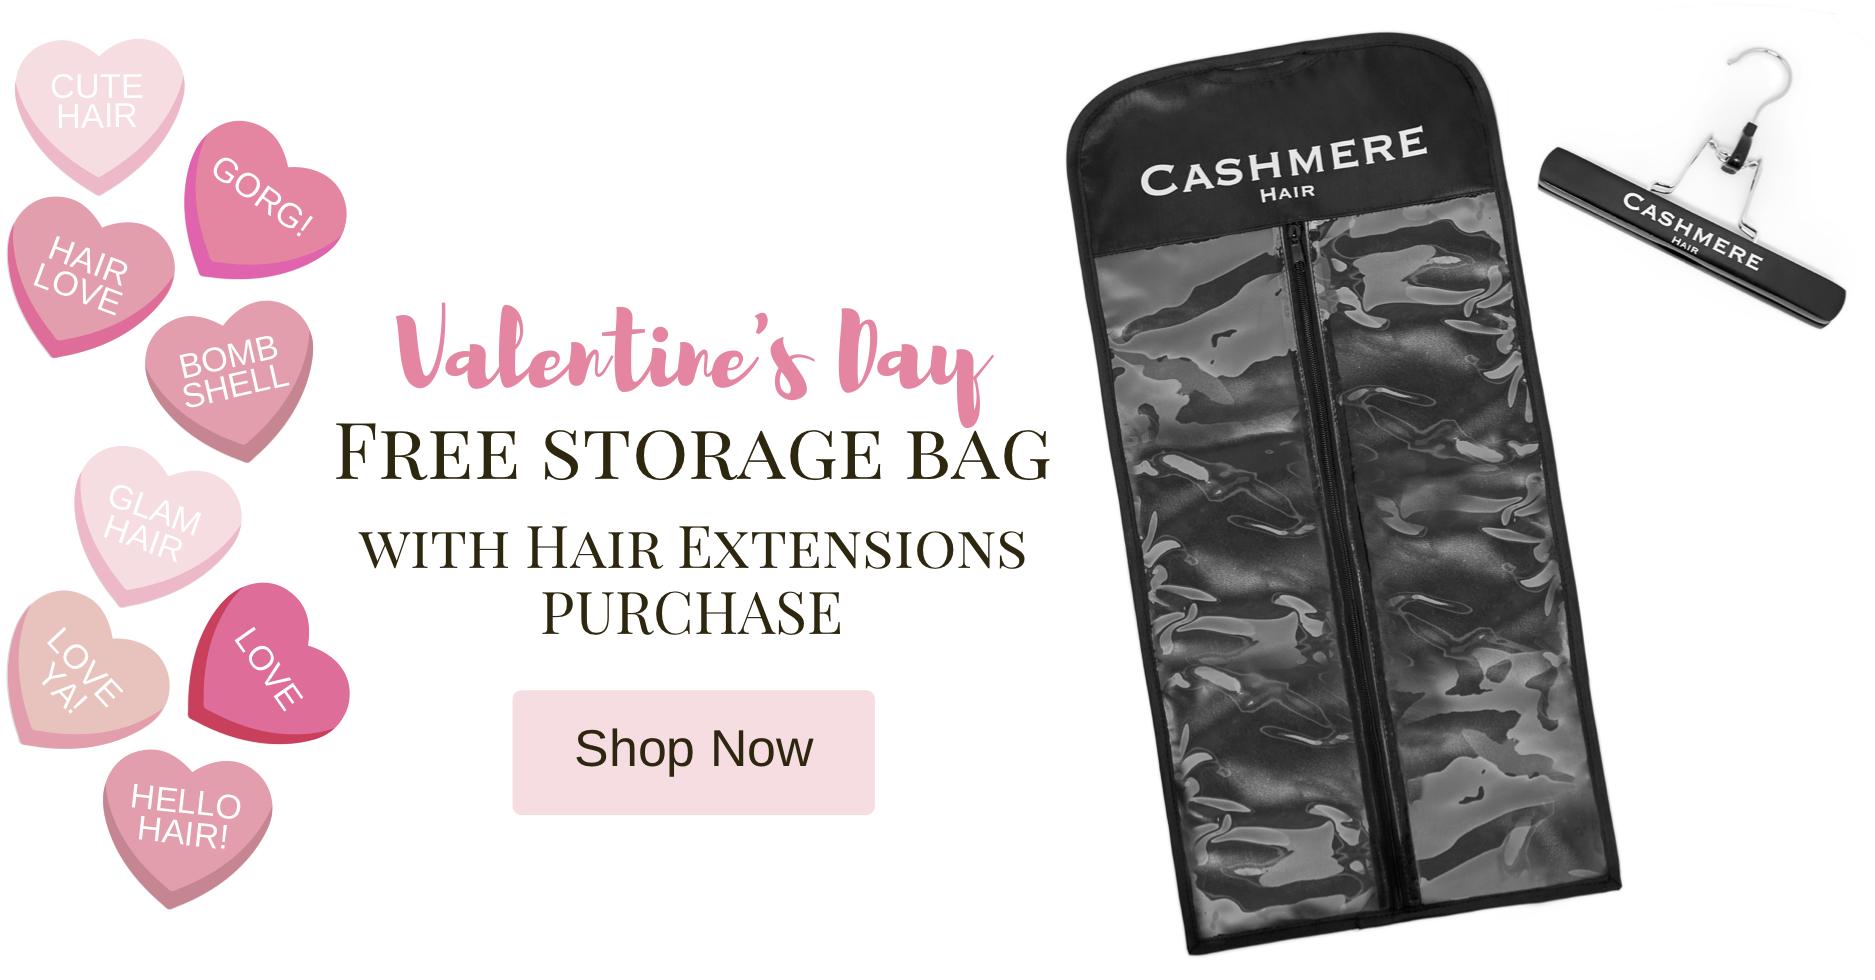 Valentine's Day Promotion- Free Storage Bag